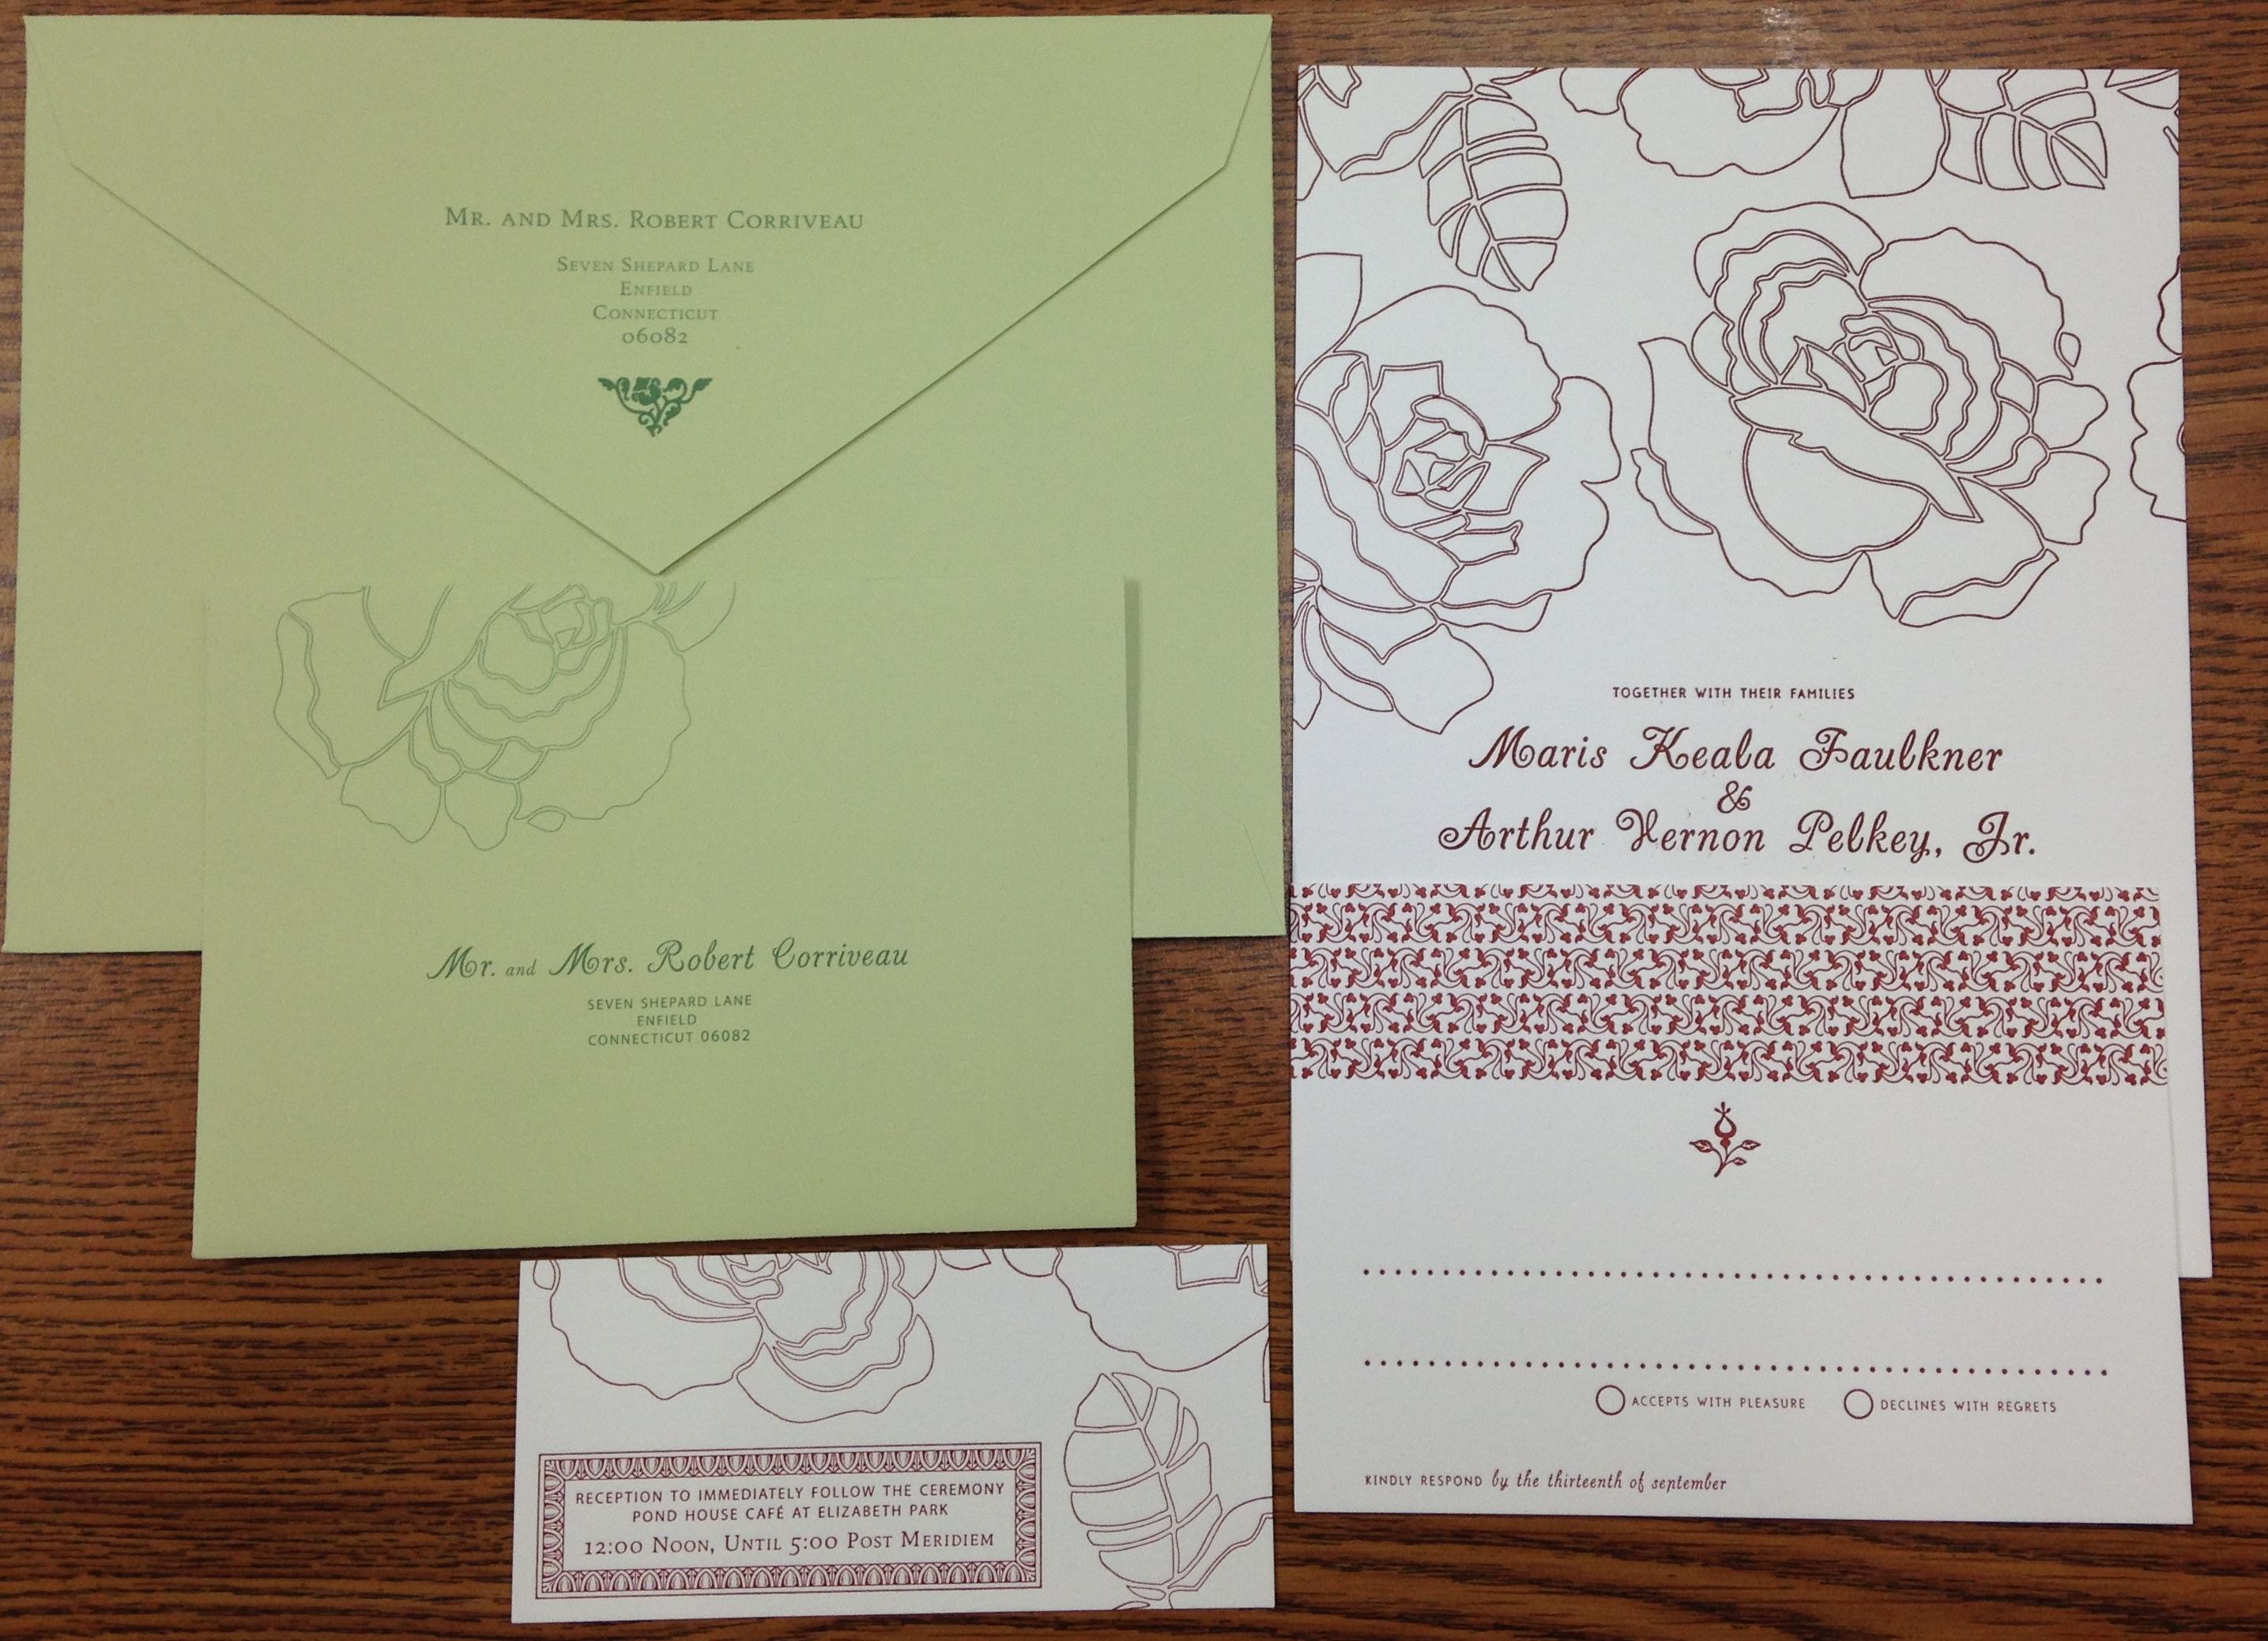 wedding invites helpful tips cannelli printing company With wedding invitation printing tips